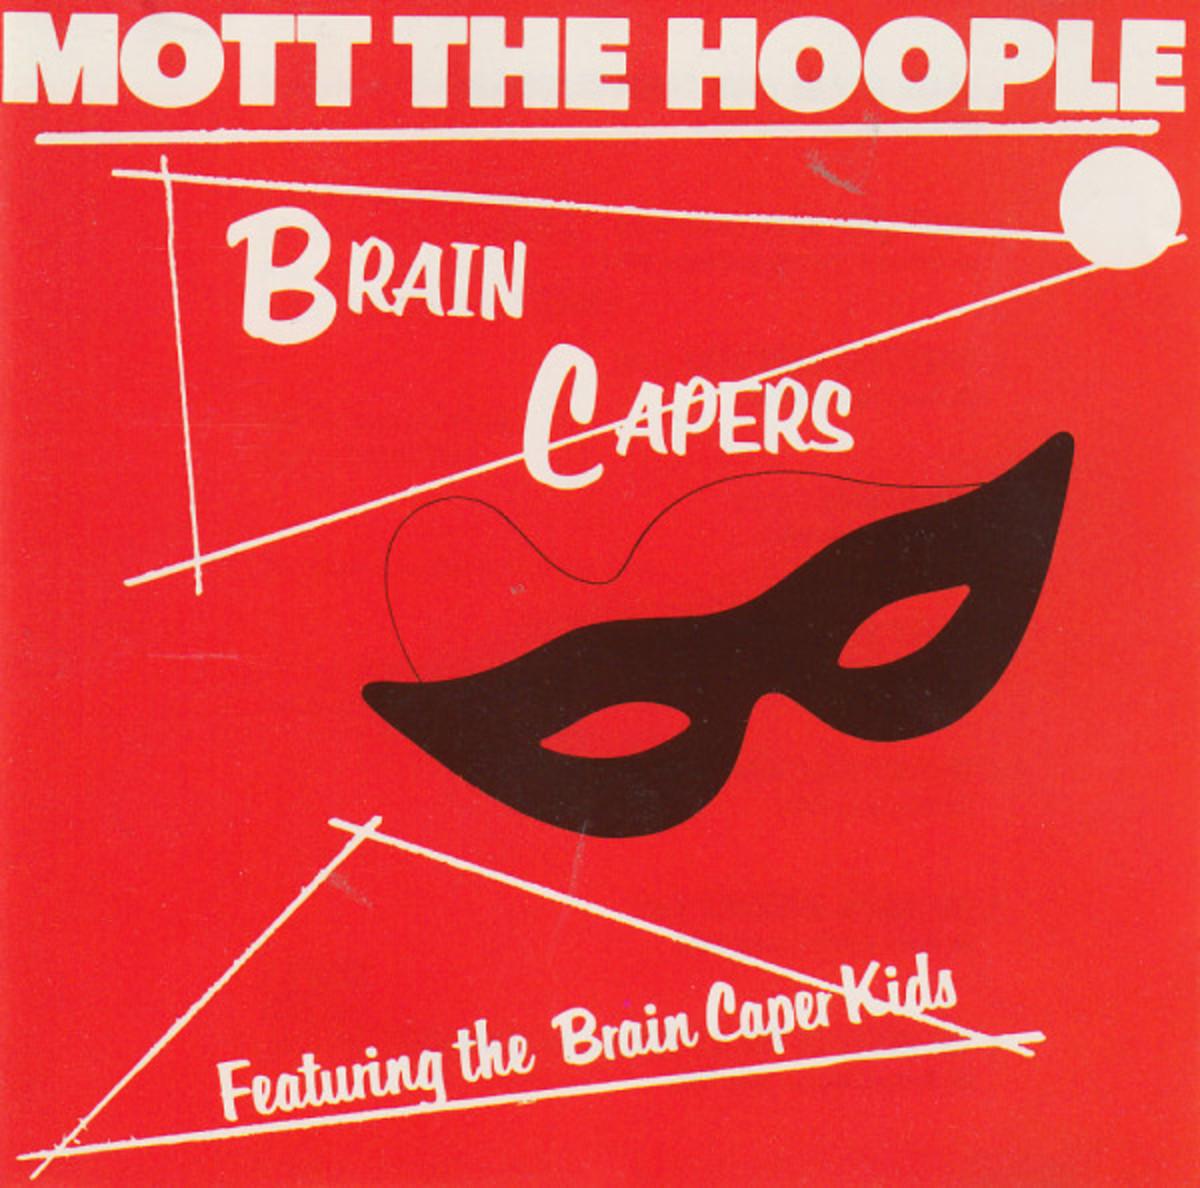 mott-brain-capers